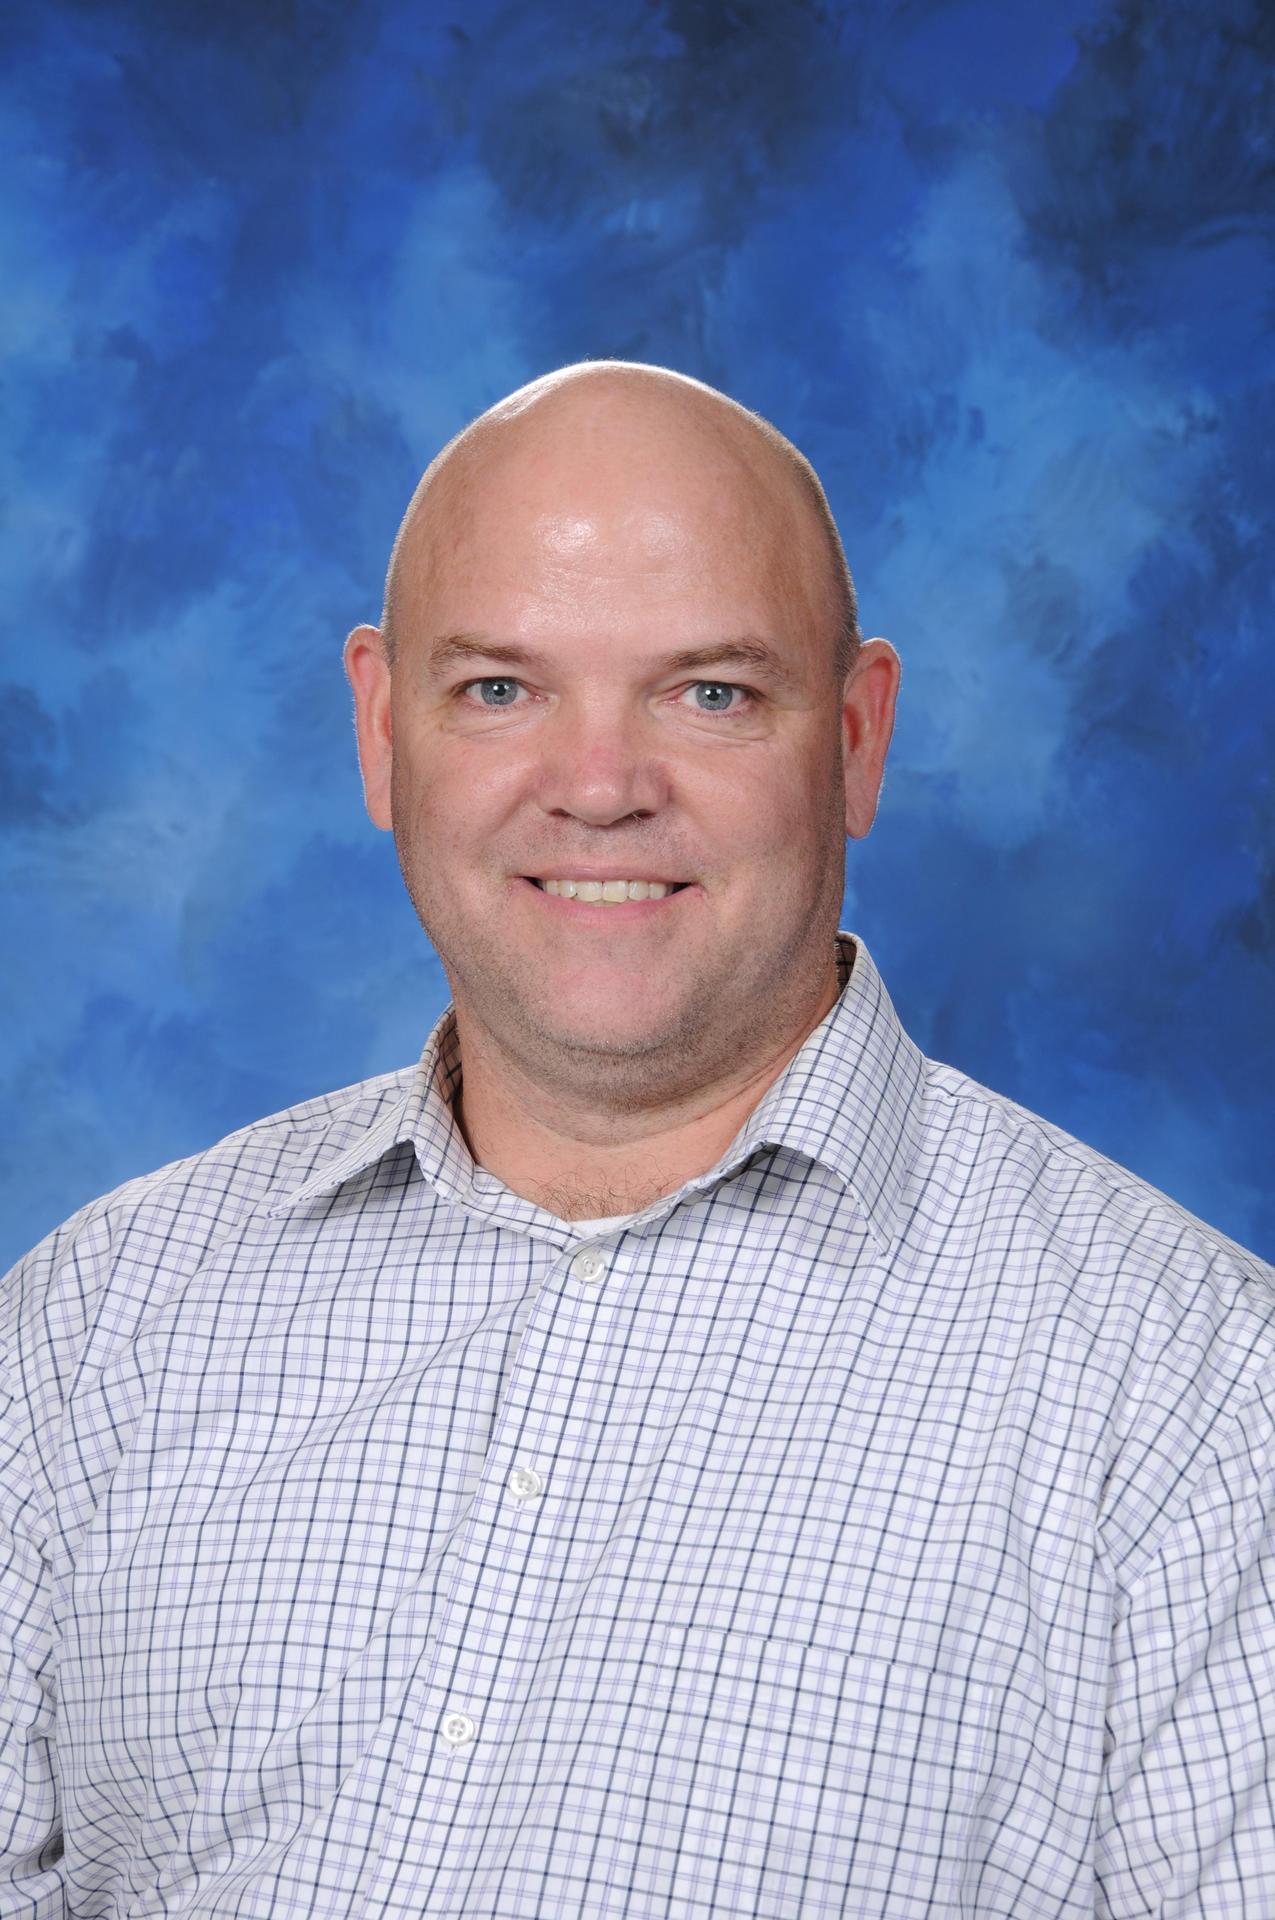 Assistant Principal Cody Swafford